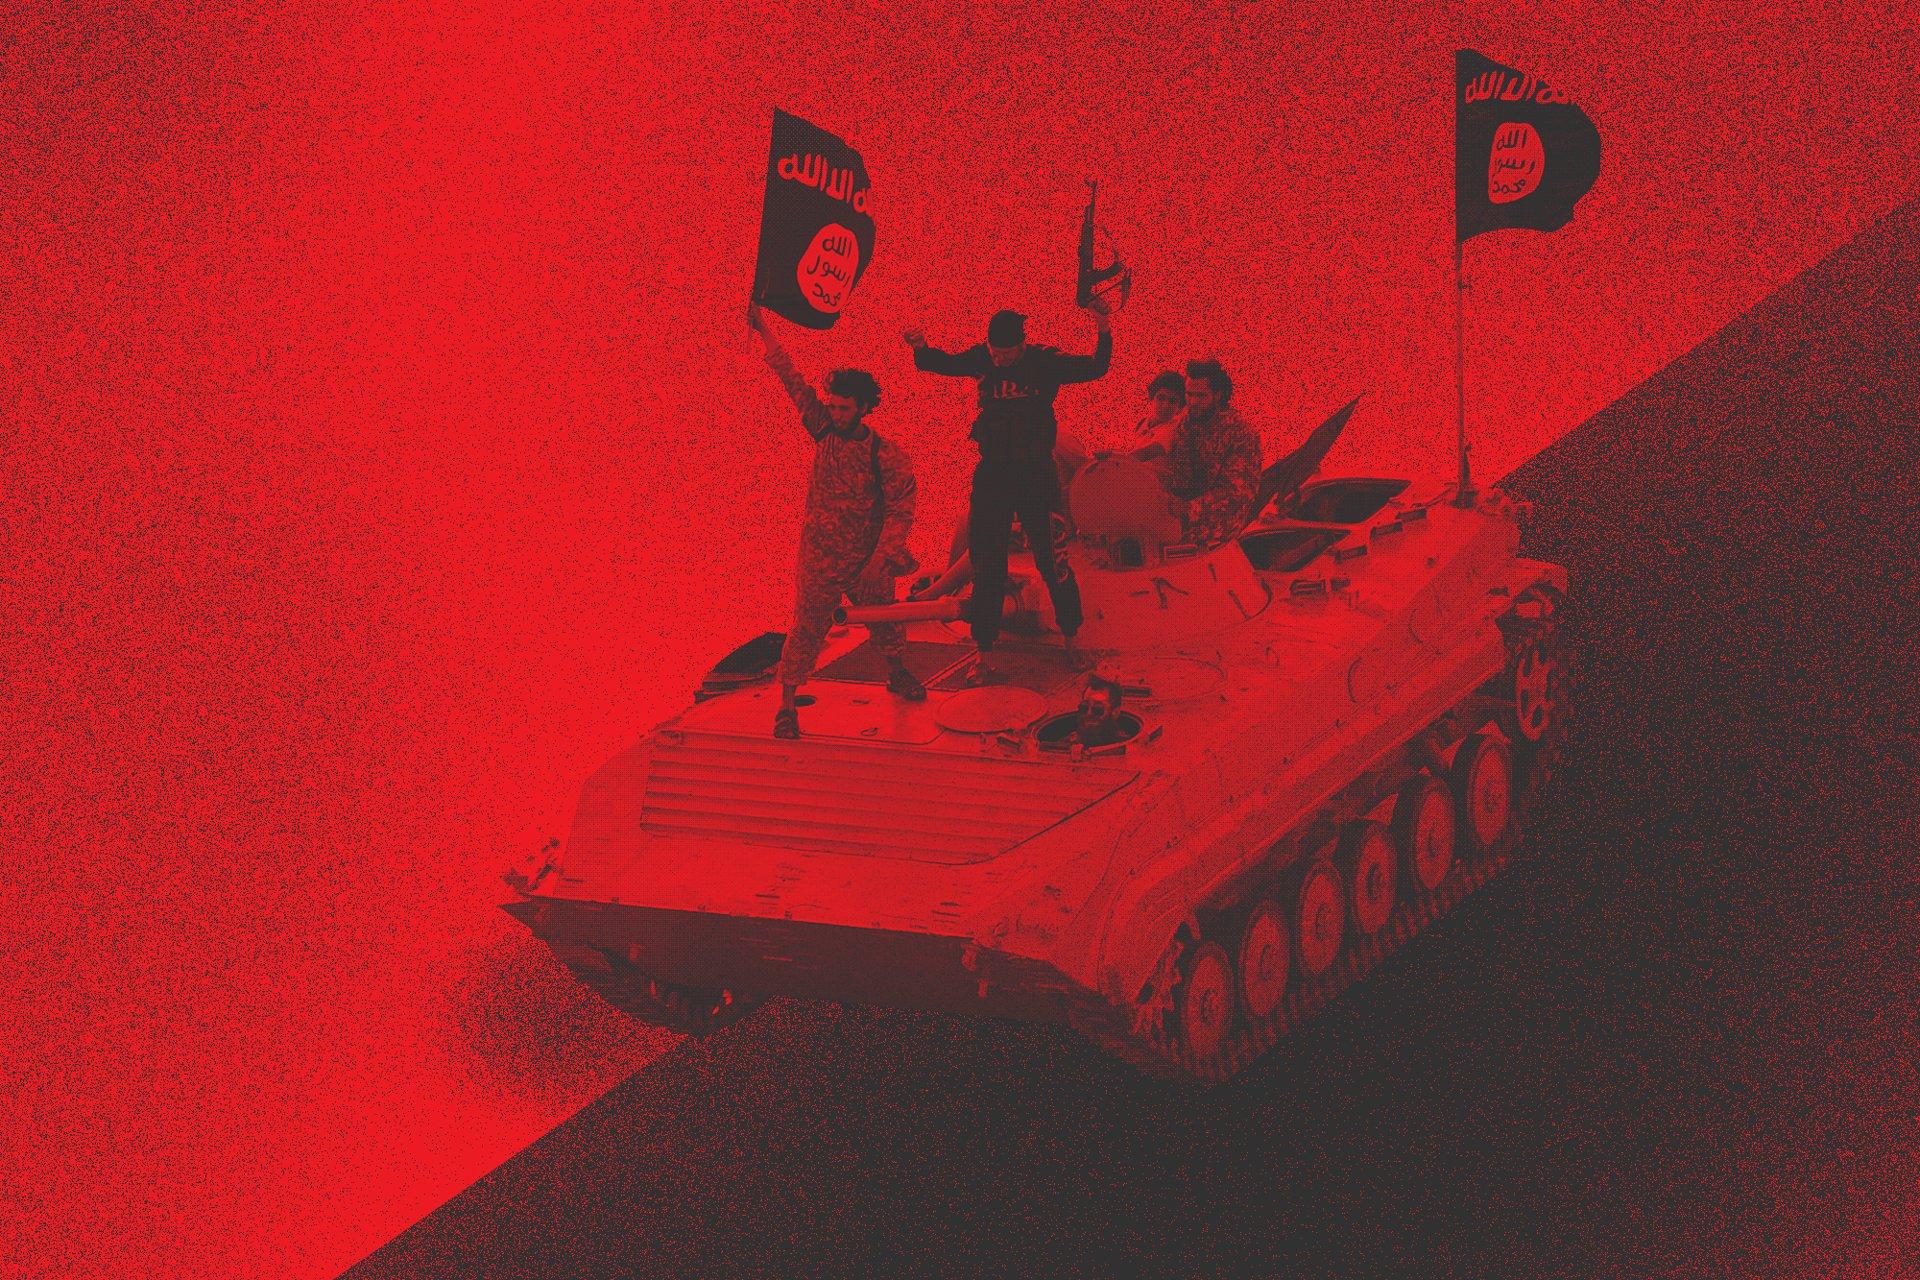 invasion of iraq 2003 essay